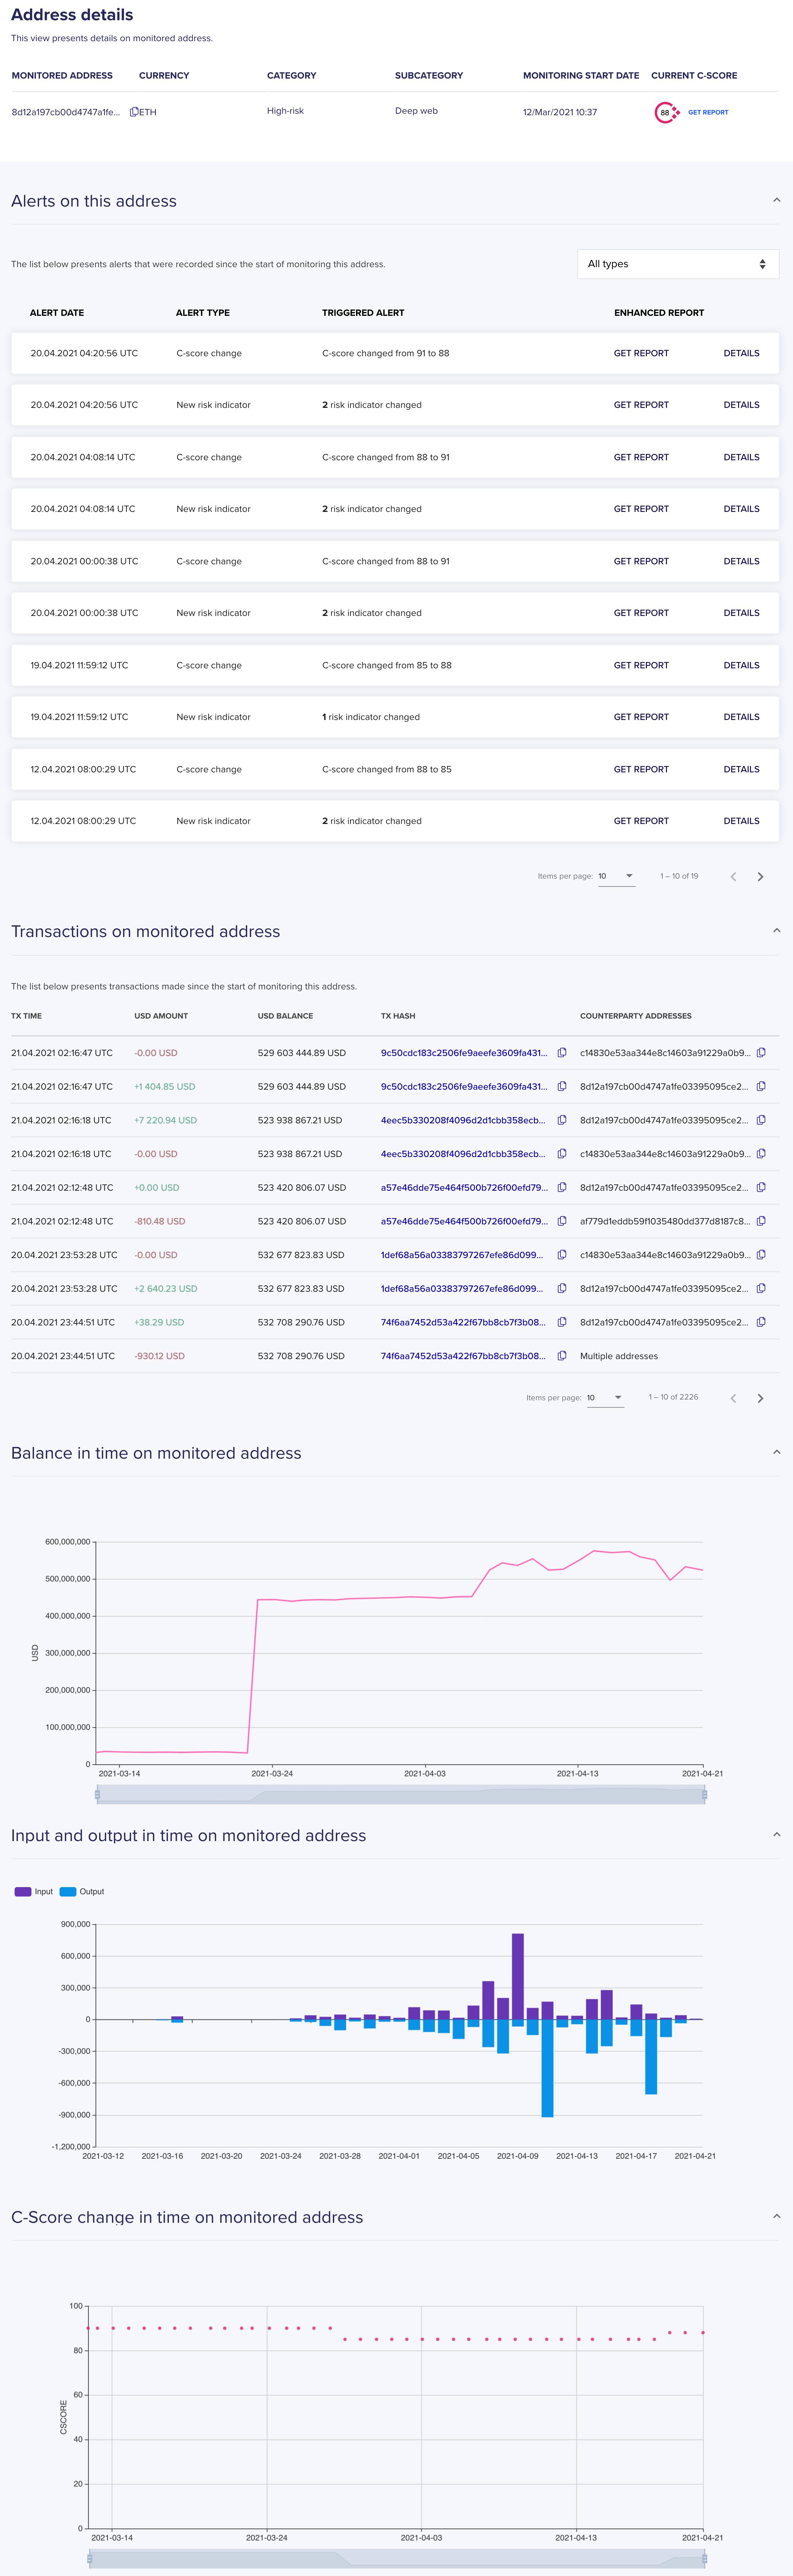 History of monitored blockchain address